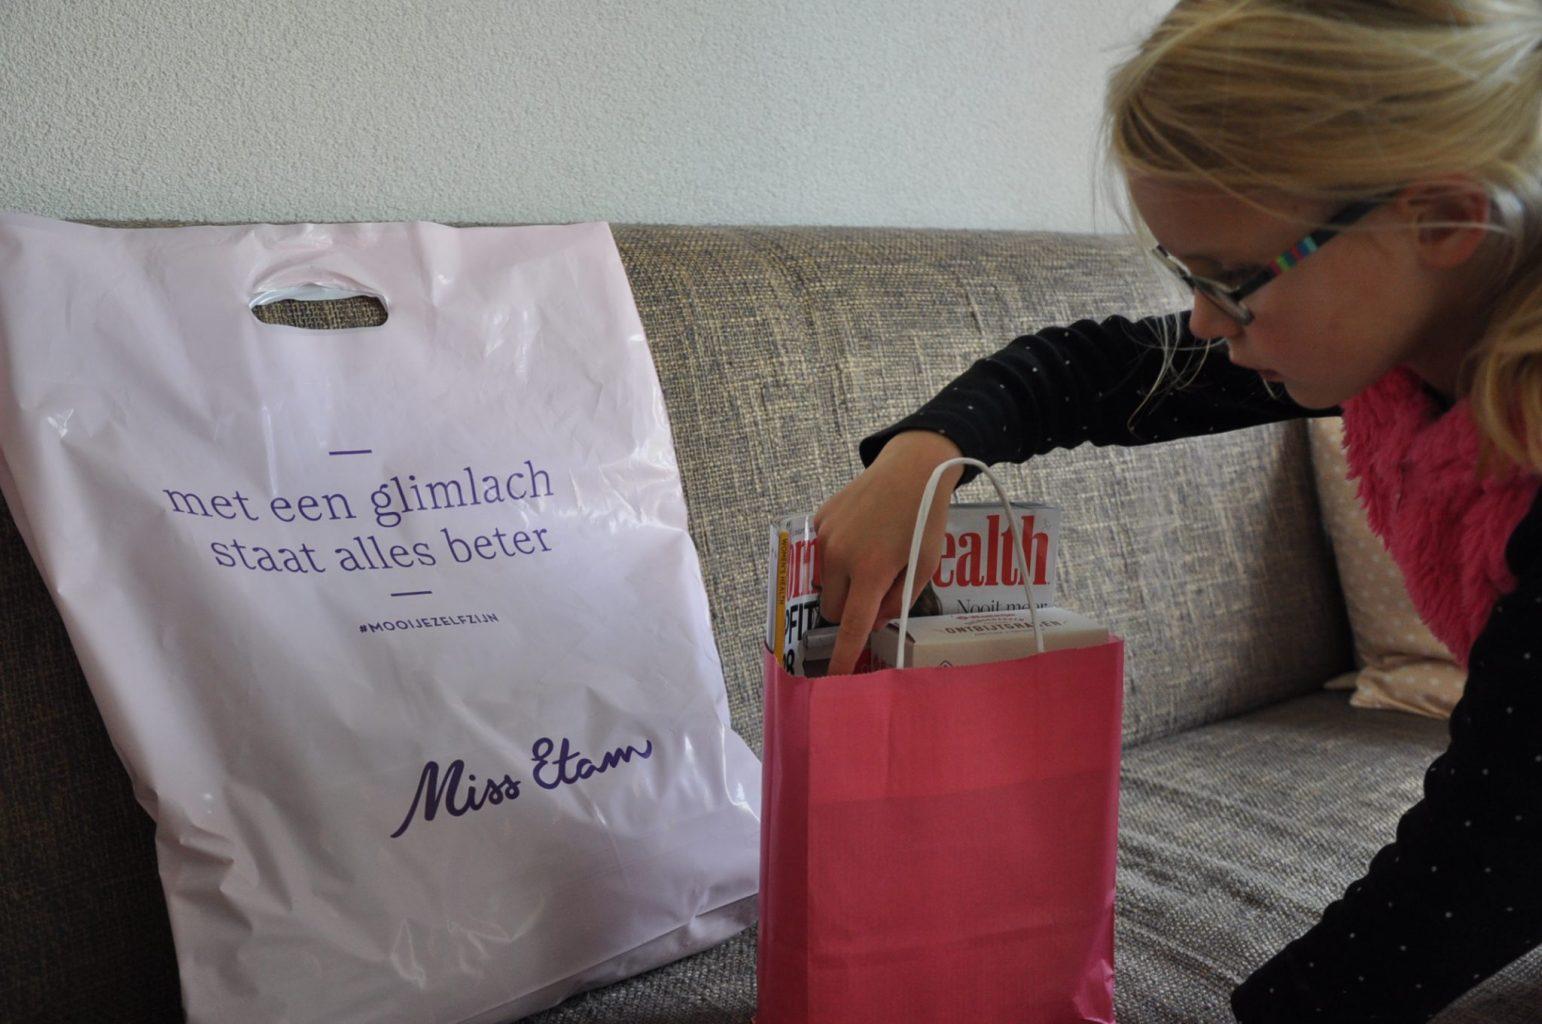 miss etam shopping